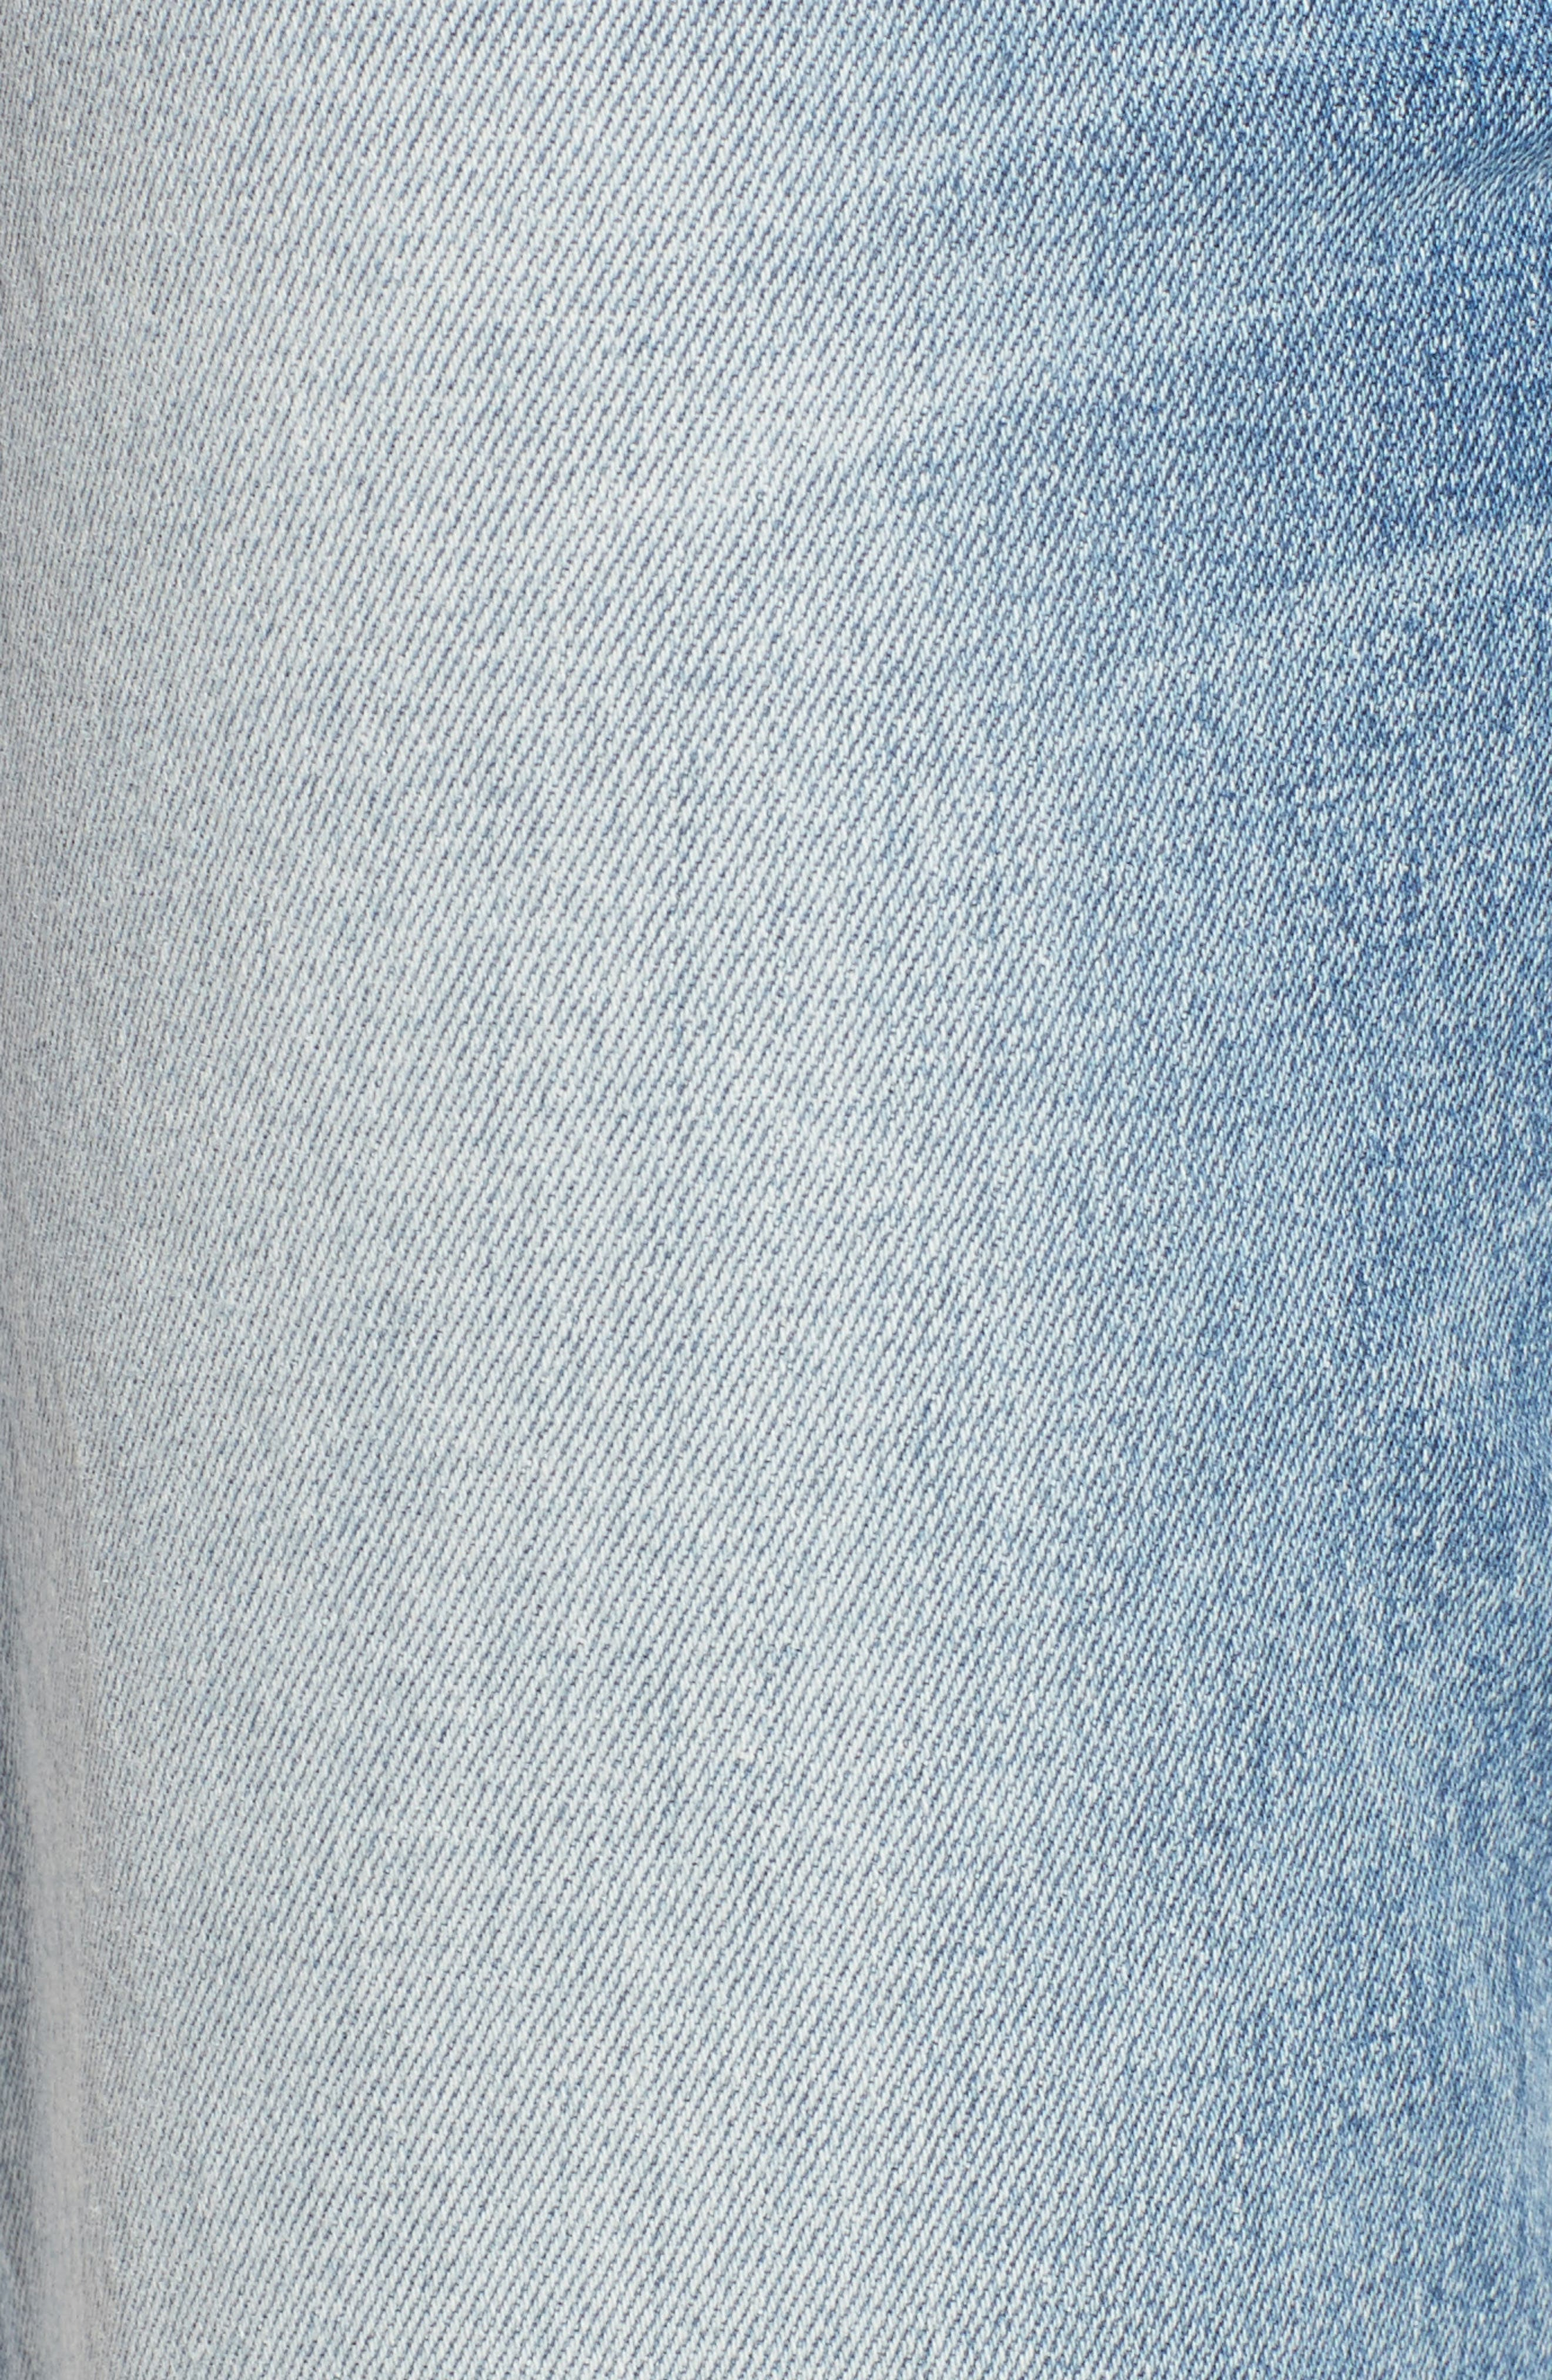 Alternate Image 5  - Hudson Jeans Zoeey High Waist Ankle Straight Leg Jeans